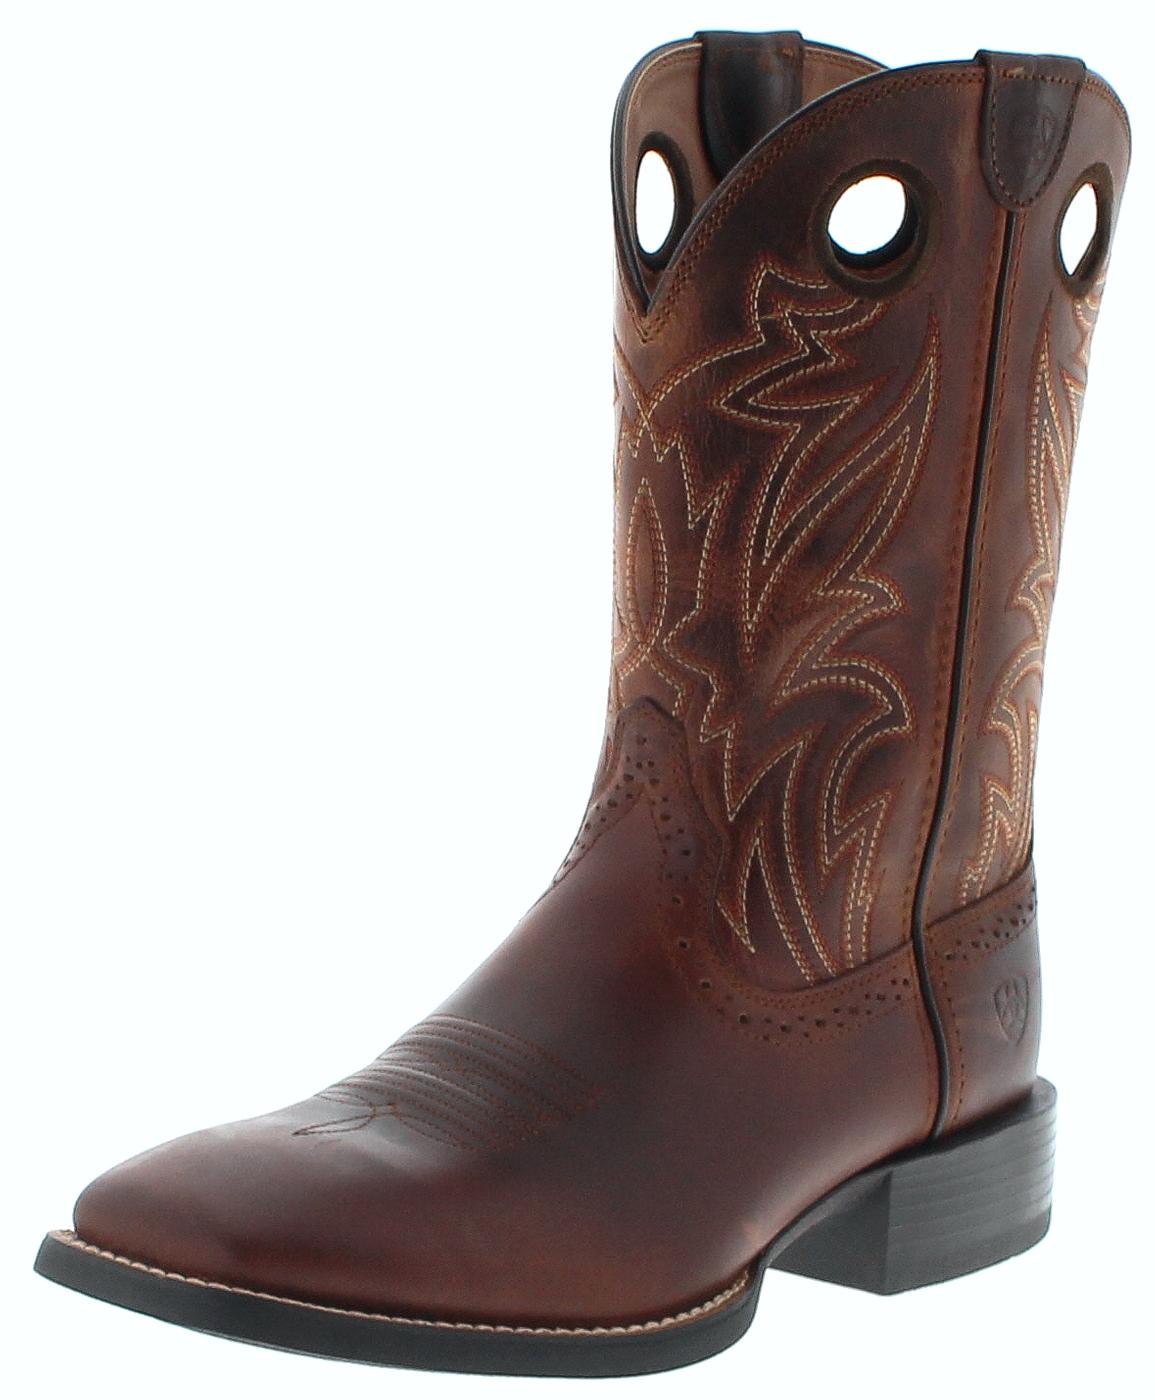 Ariat 25131 SPORT SIDEBET Nutmeg Men's Western Riding Boots - brown